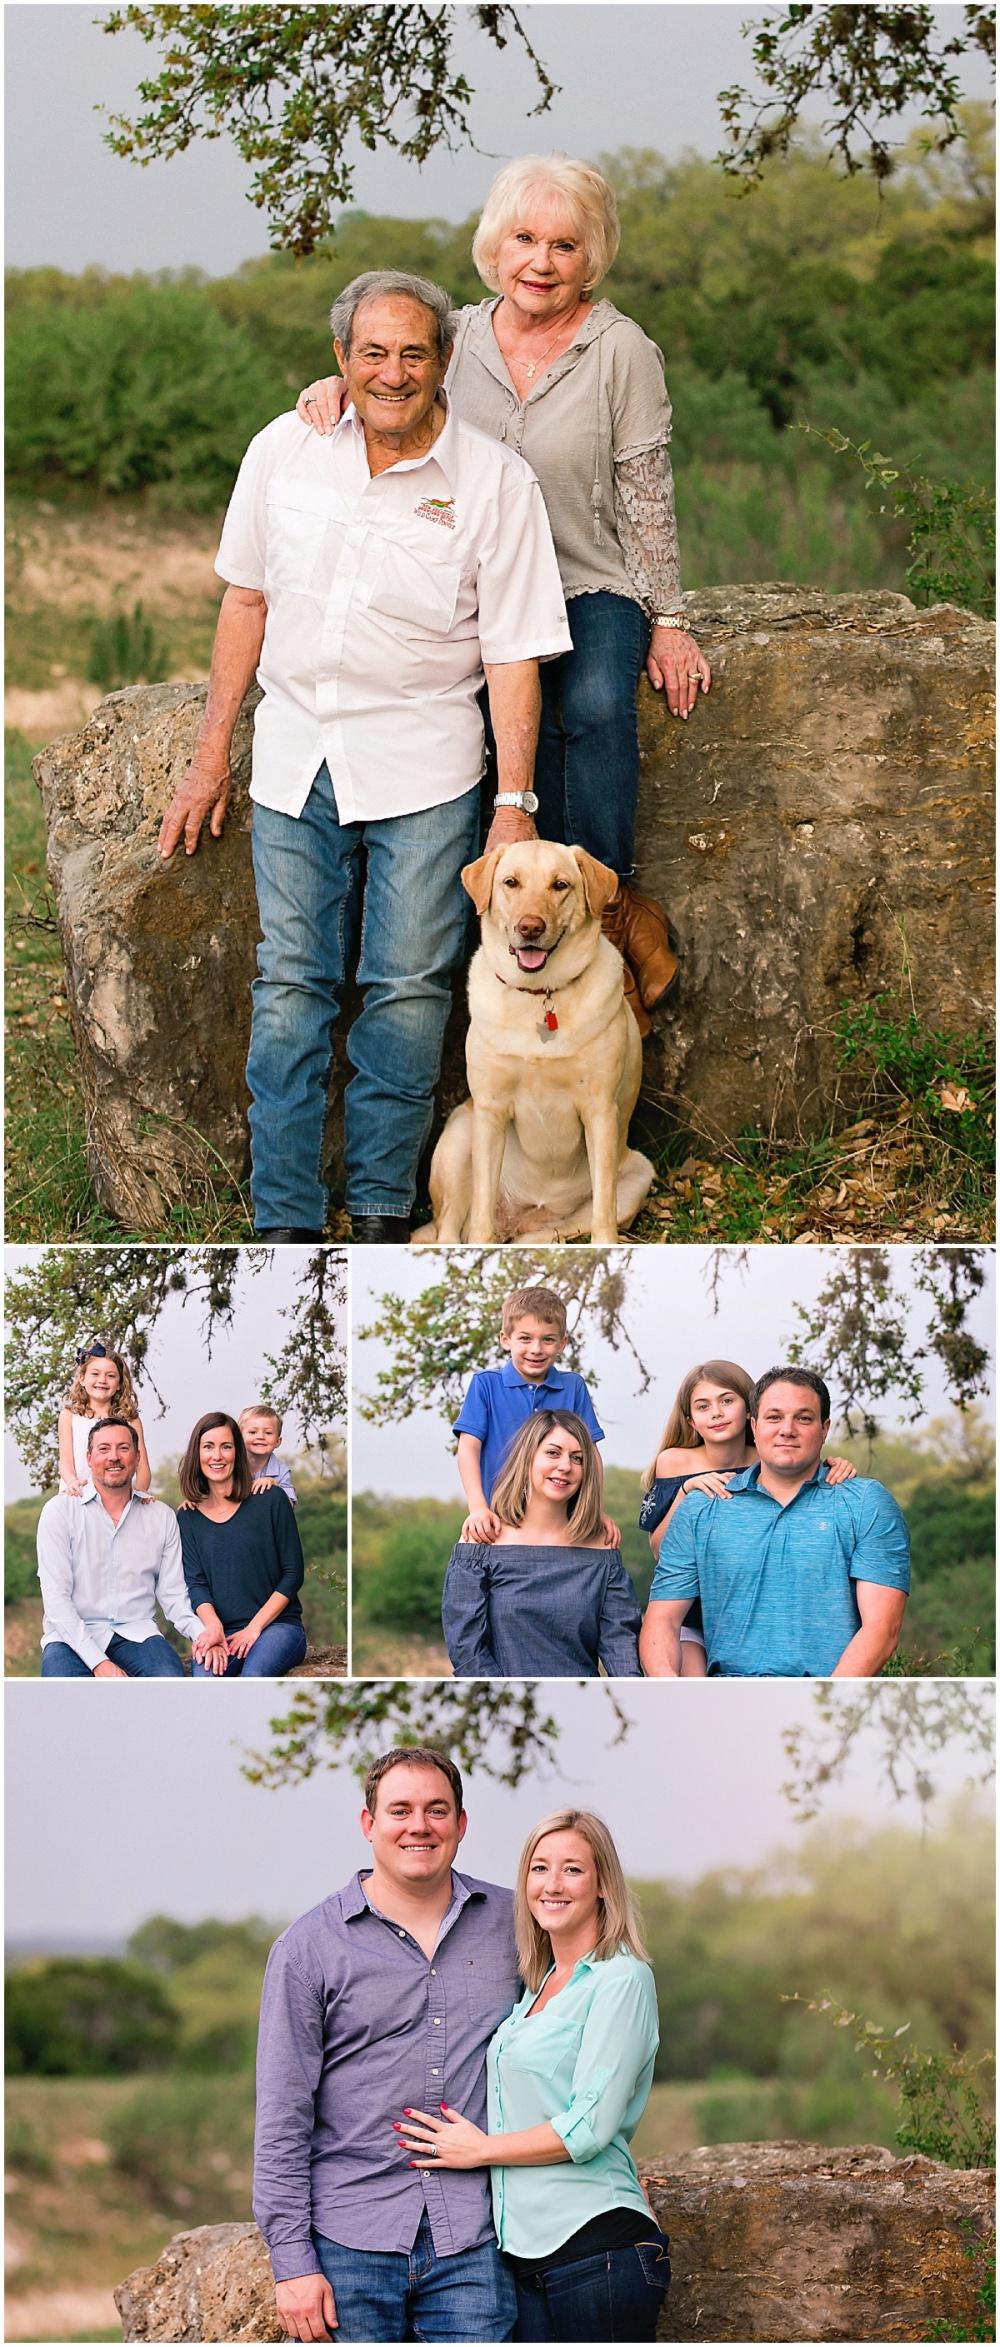 Family-Portraits-Classen-New-Braunels-Ranch-Carly-Barton-Photography_0044.jpg